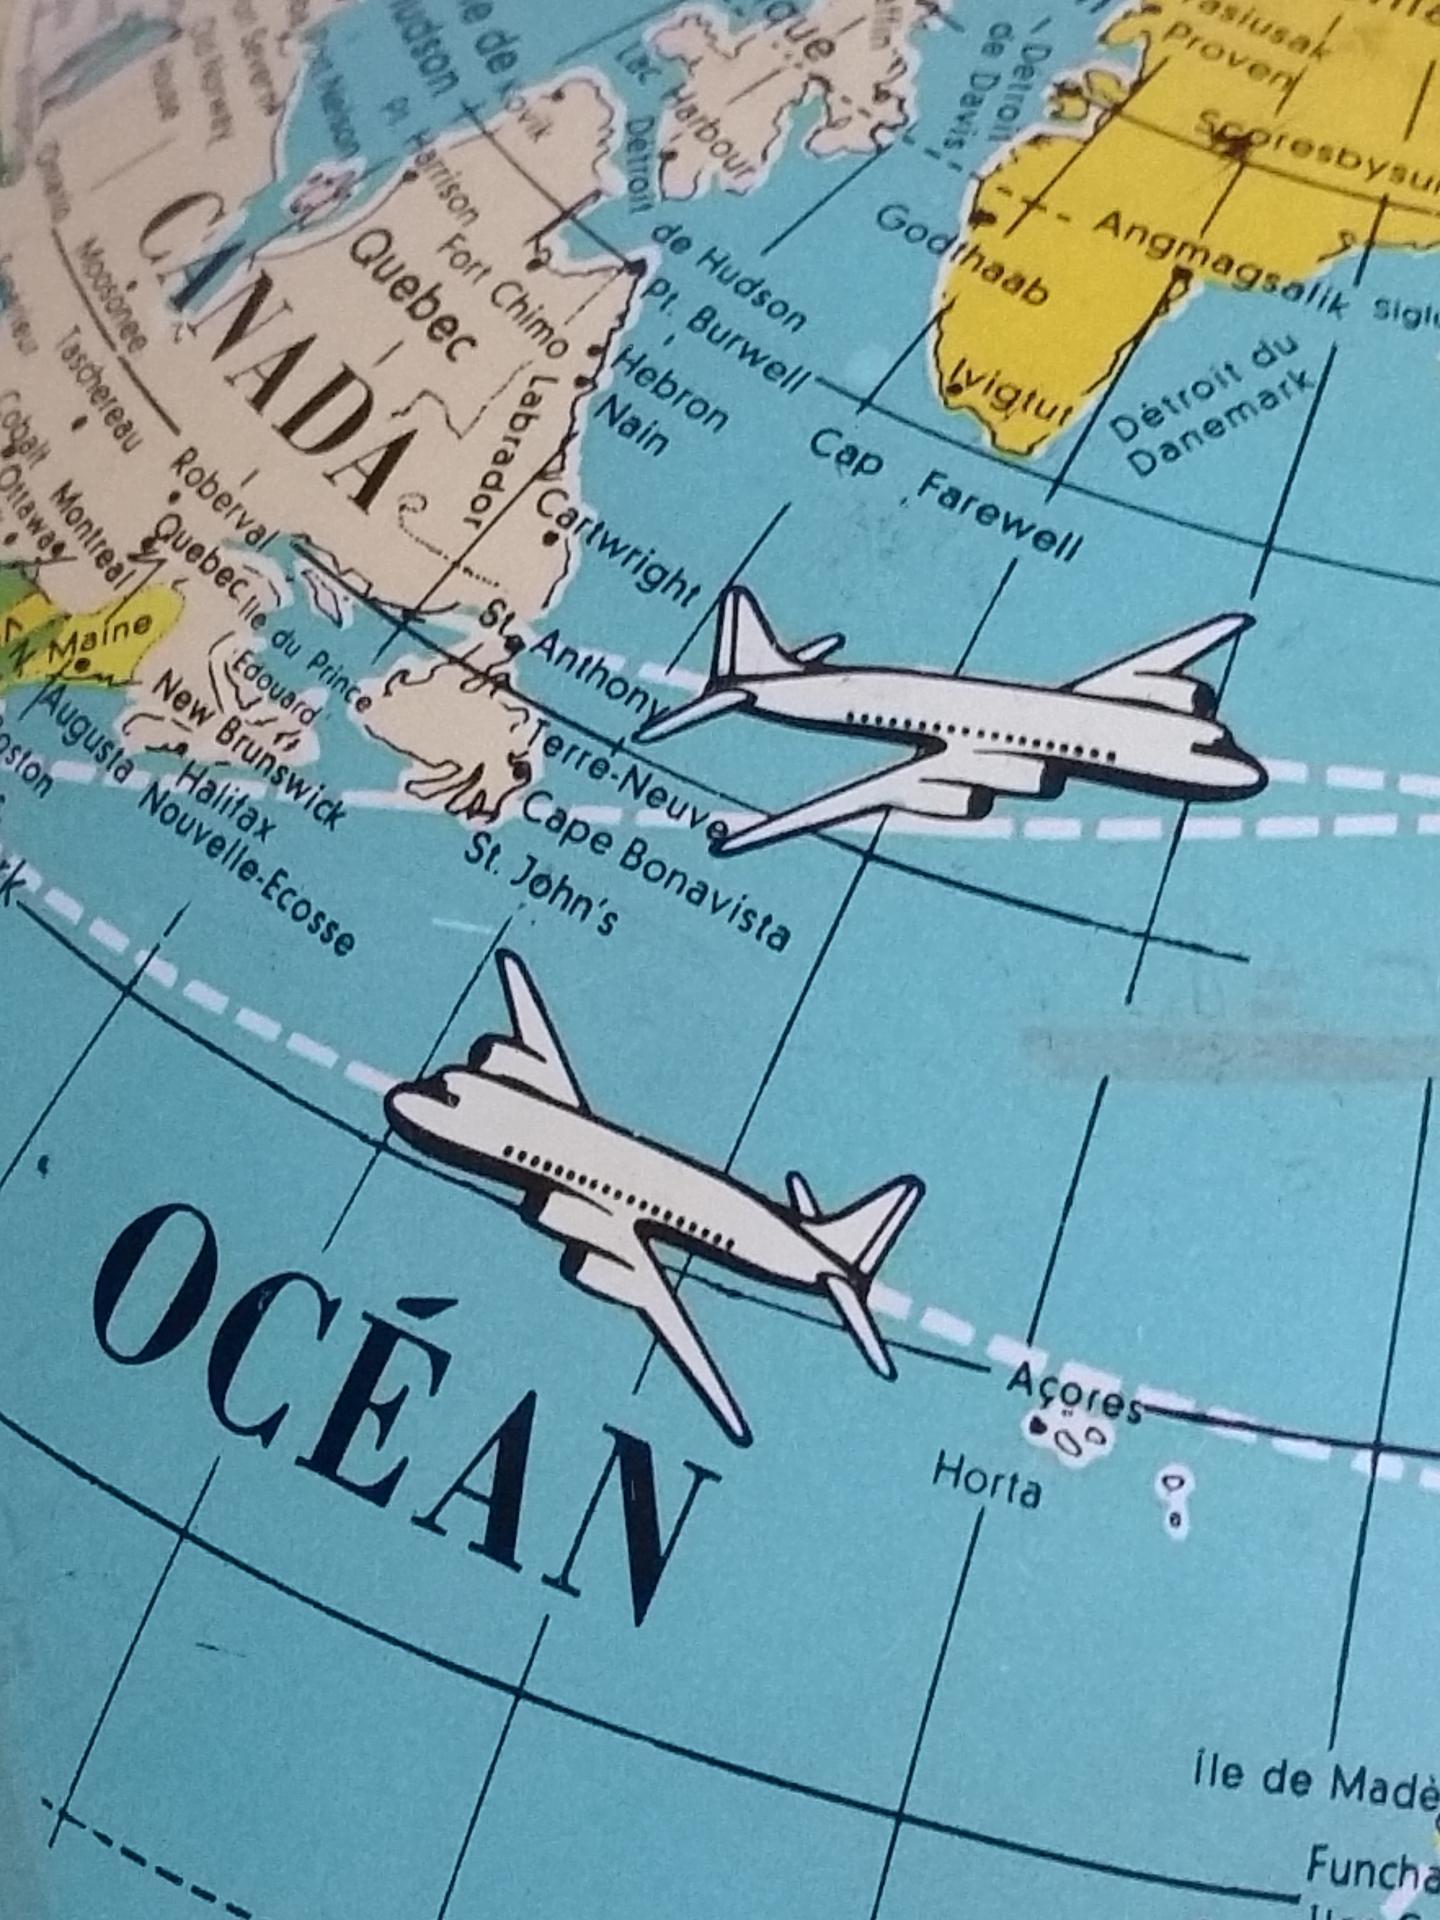 5 globe avions